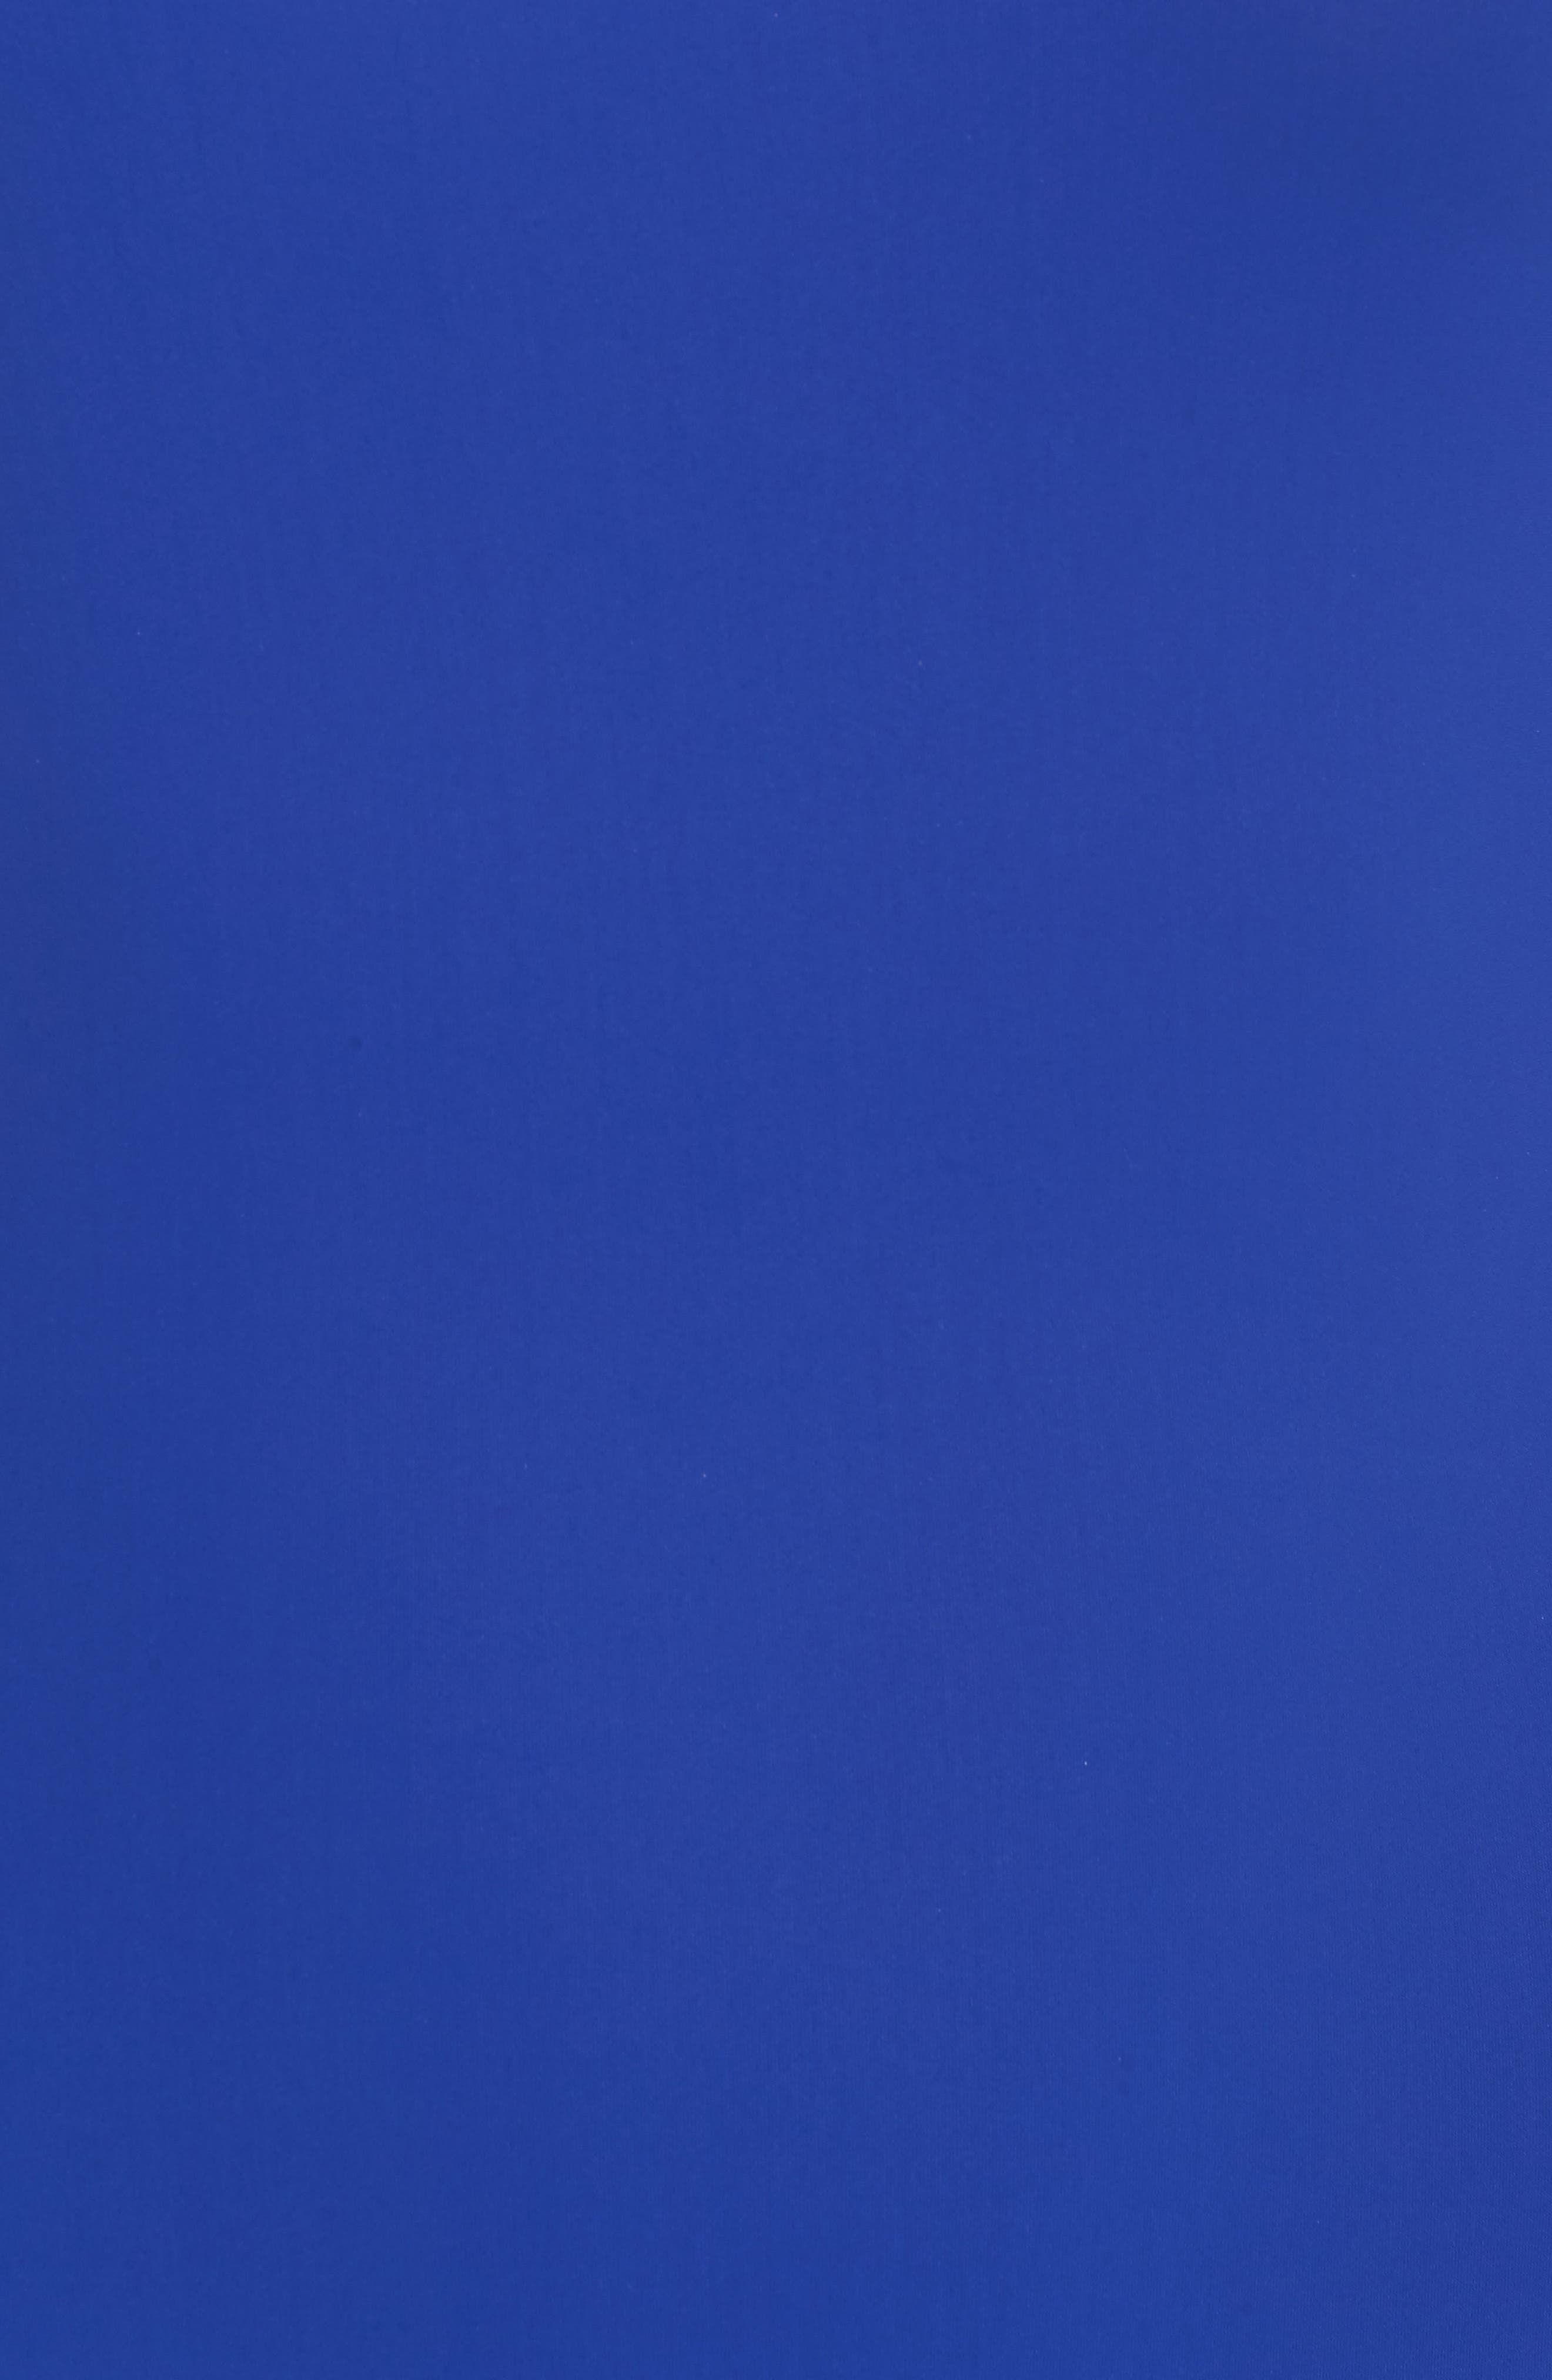 Halter One-Piece Swimsuit,                             Alternate thumbnail 5, color,                             Klein Blue